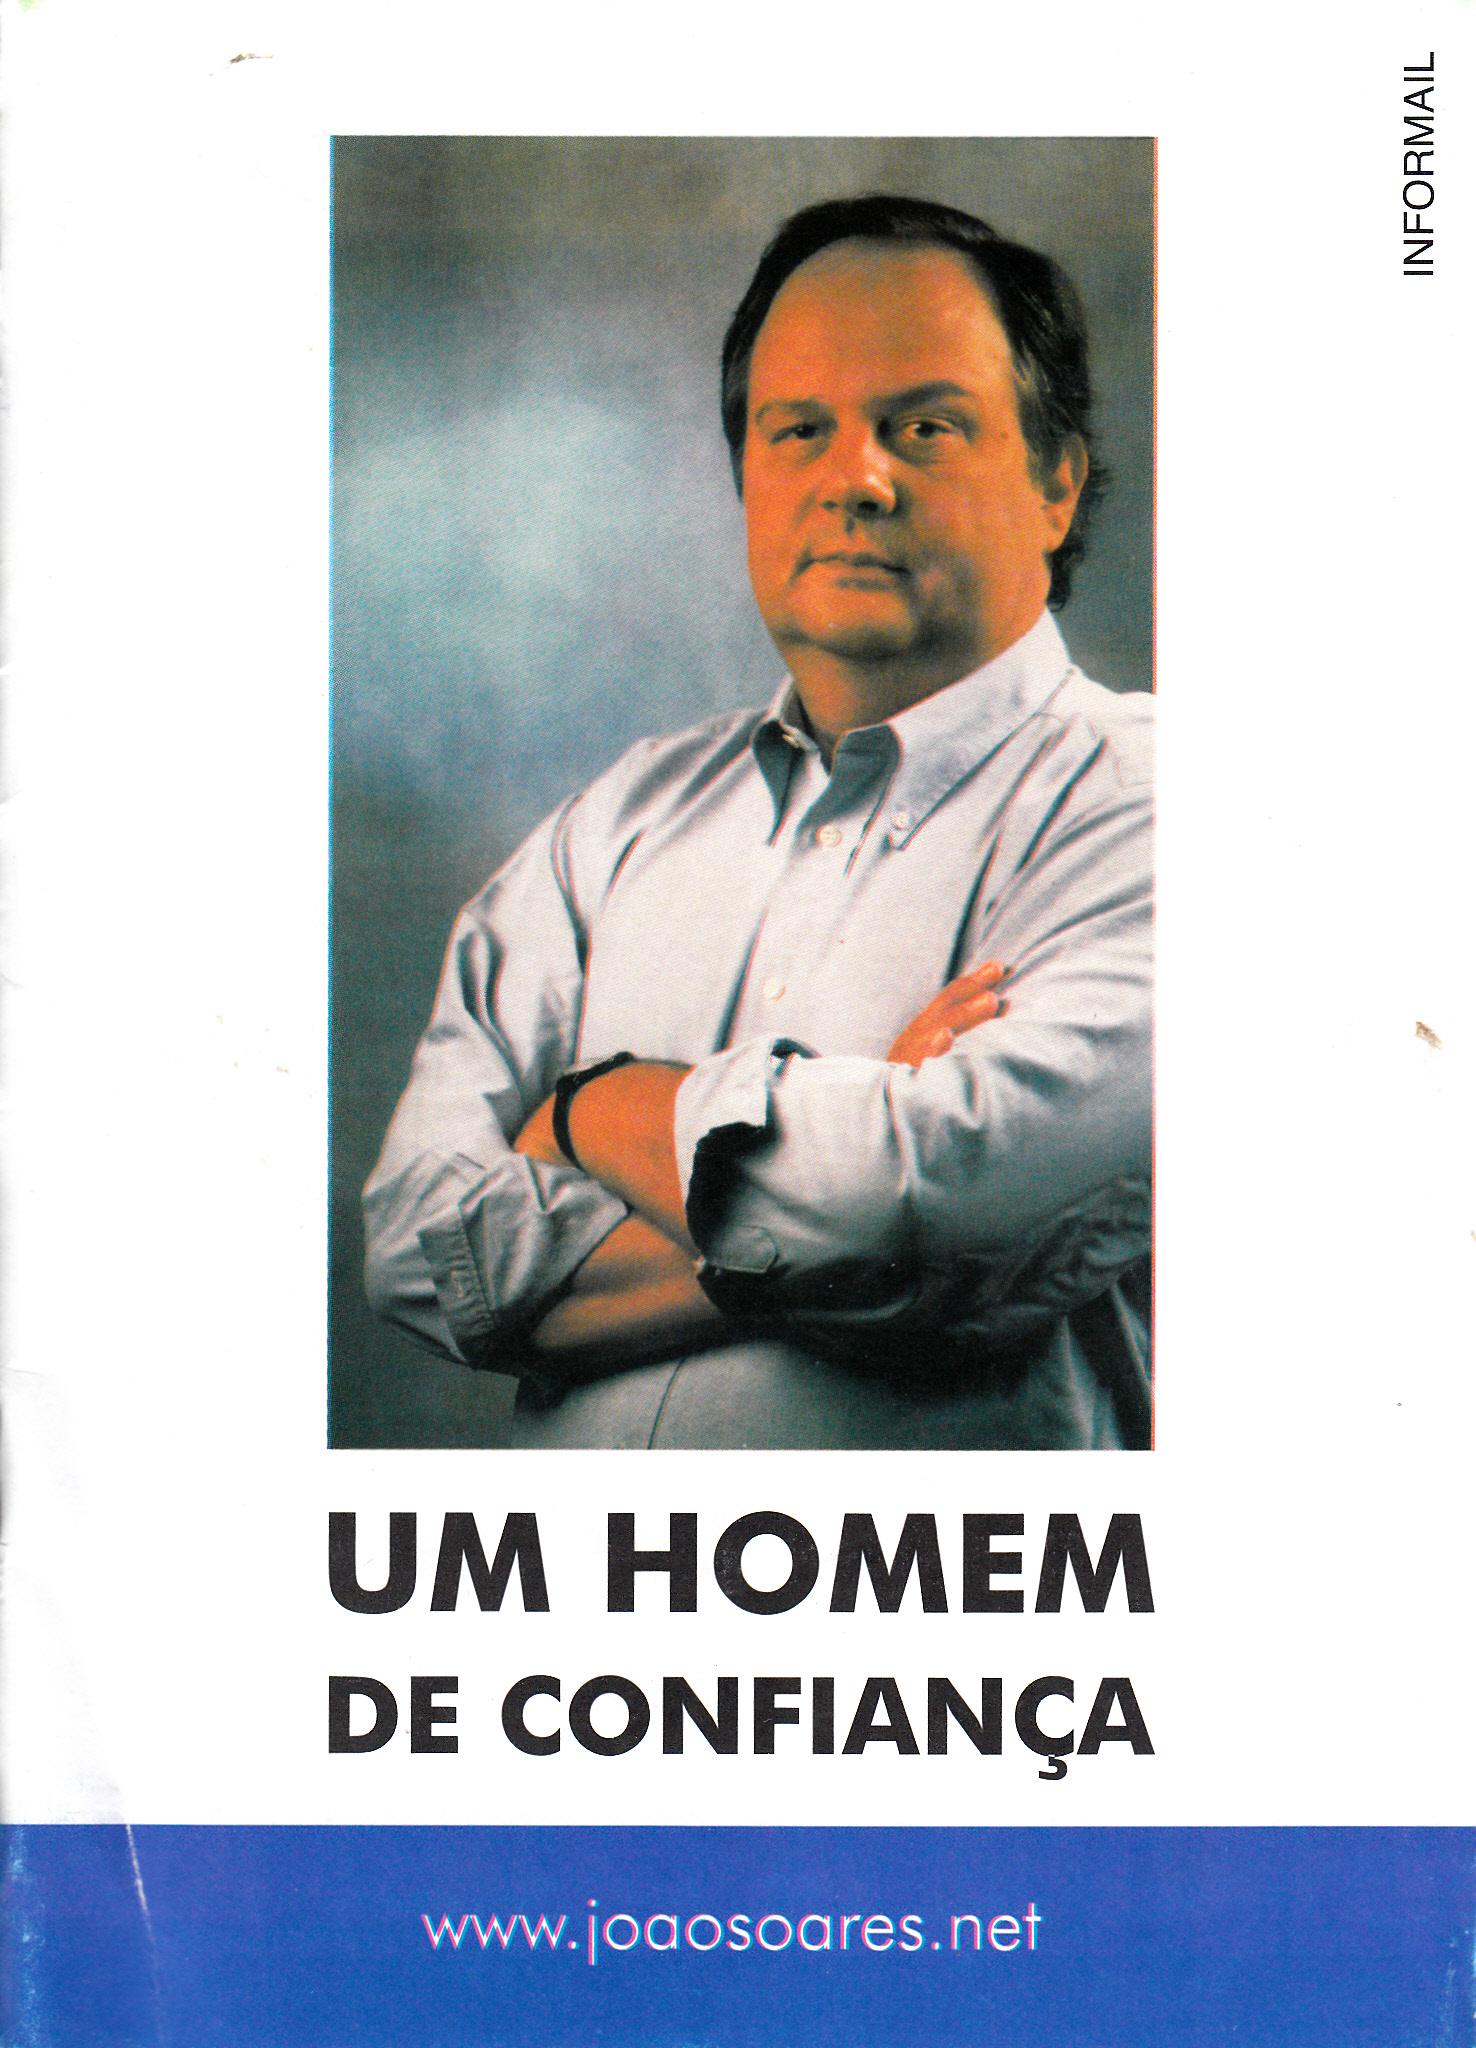 PS_CDU_2001_Lisboa